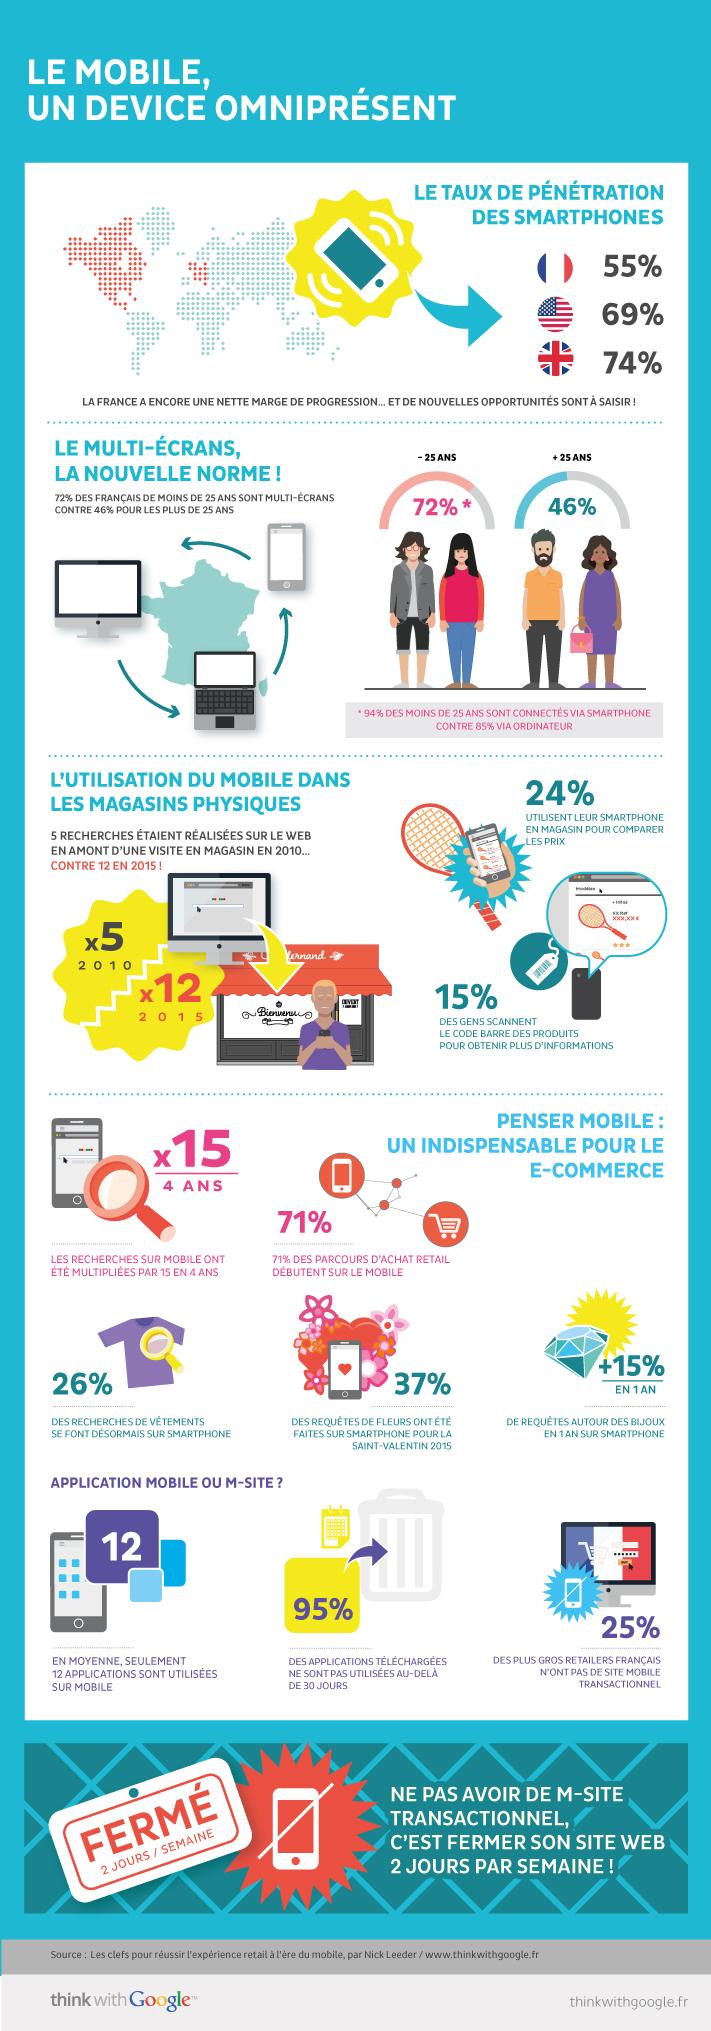 infographie-google-chiffres-cls-mobile-en-france-2015-1-638